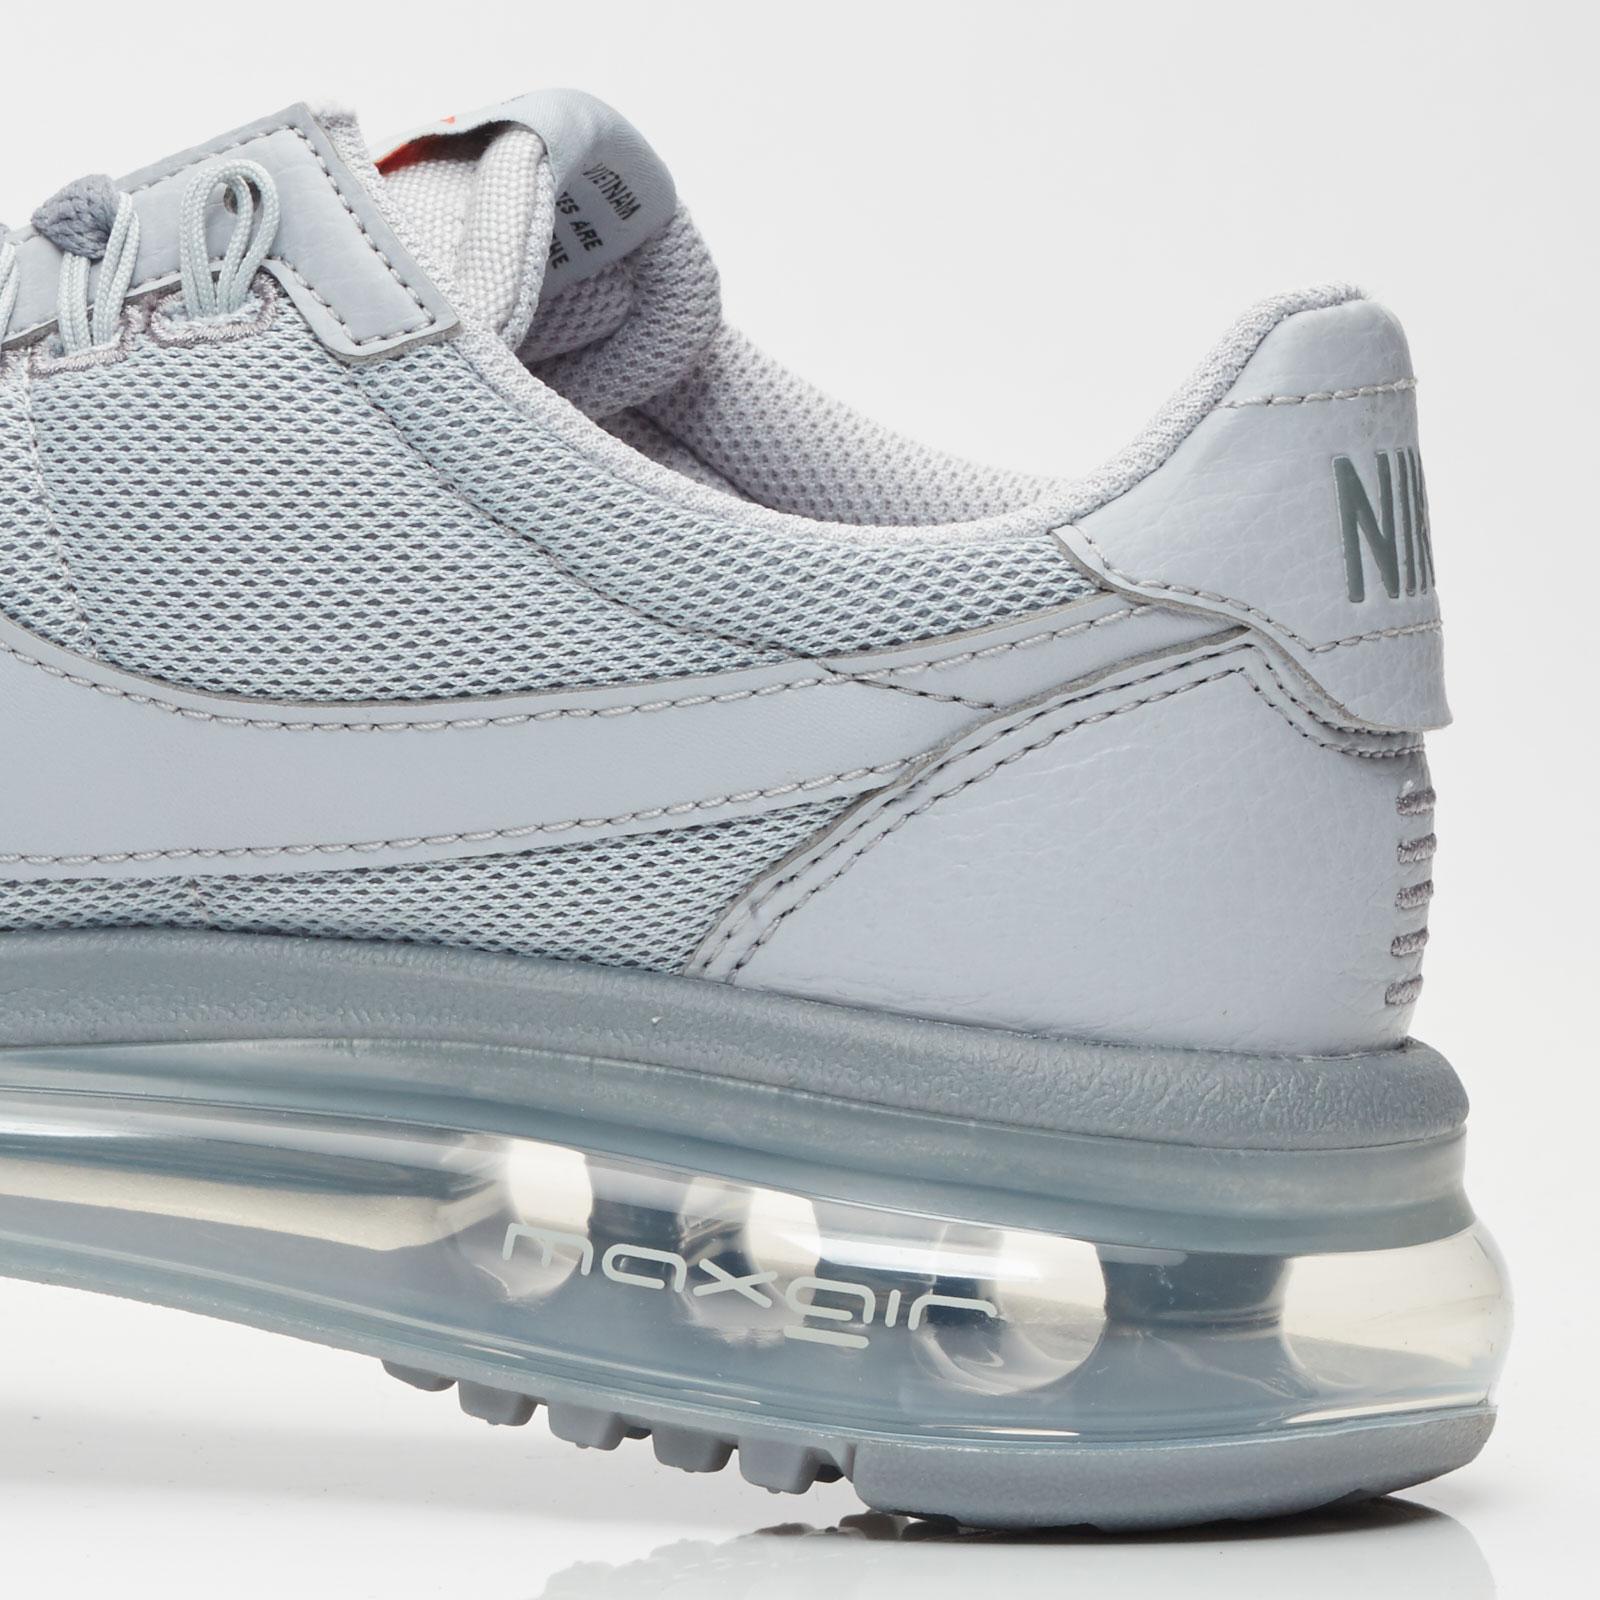 Nike Wmns Air Max Ld Zero 896495 001 Sneakersnstuff